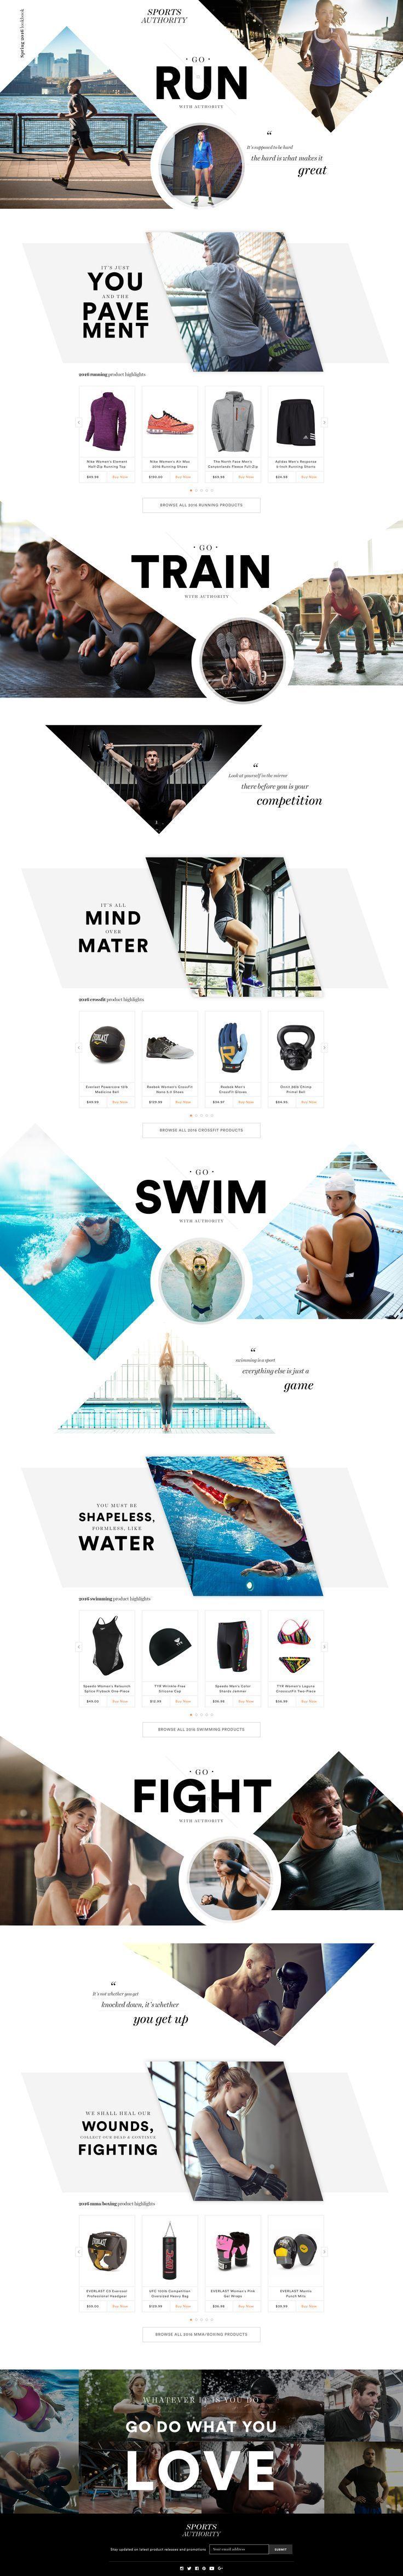 Web design | Sports authority lookbook2016 jason kirtley 1x ...